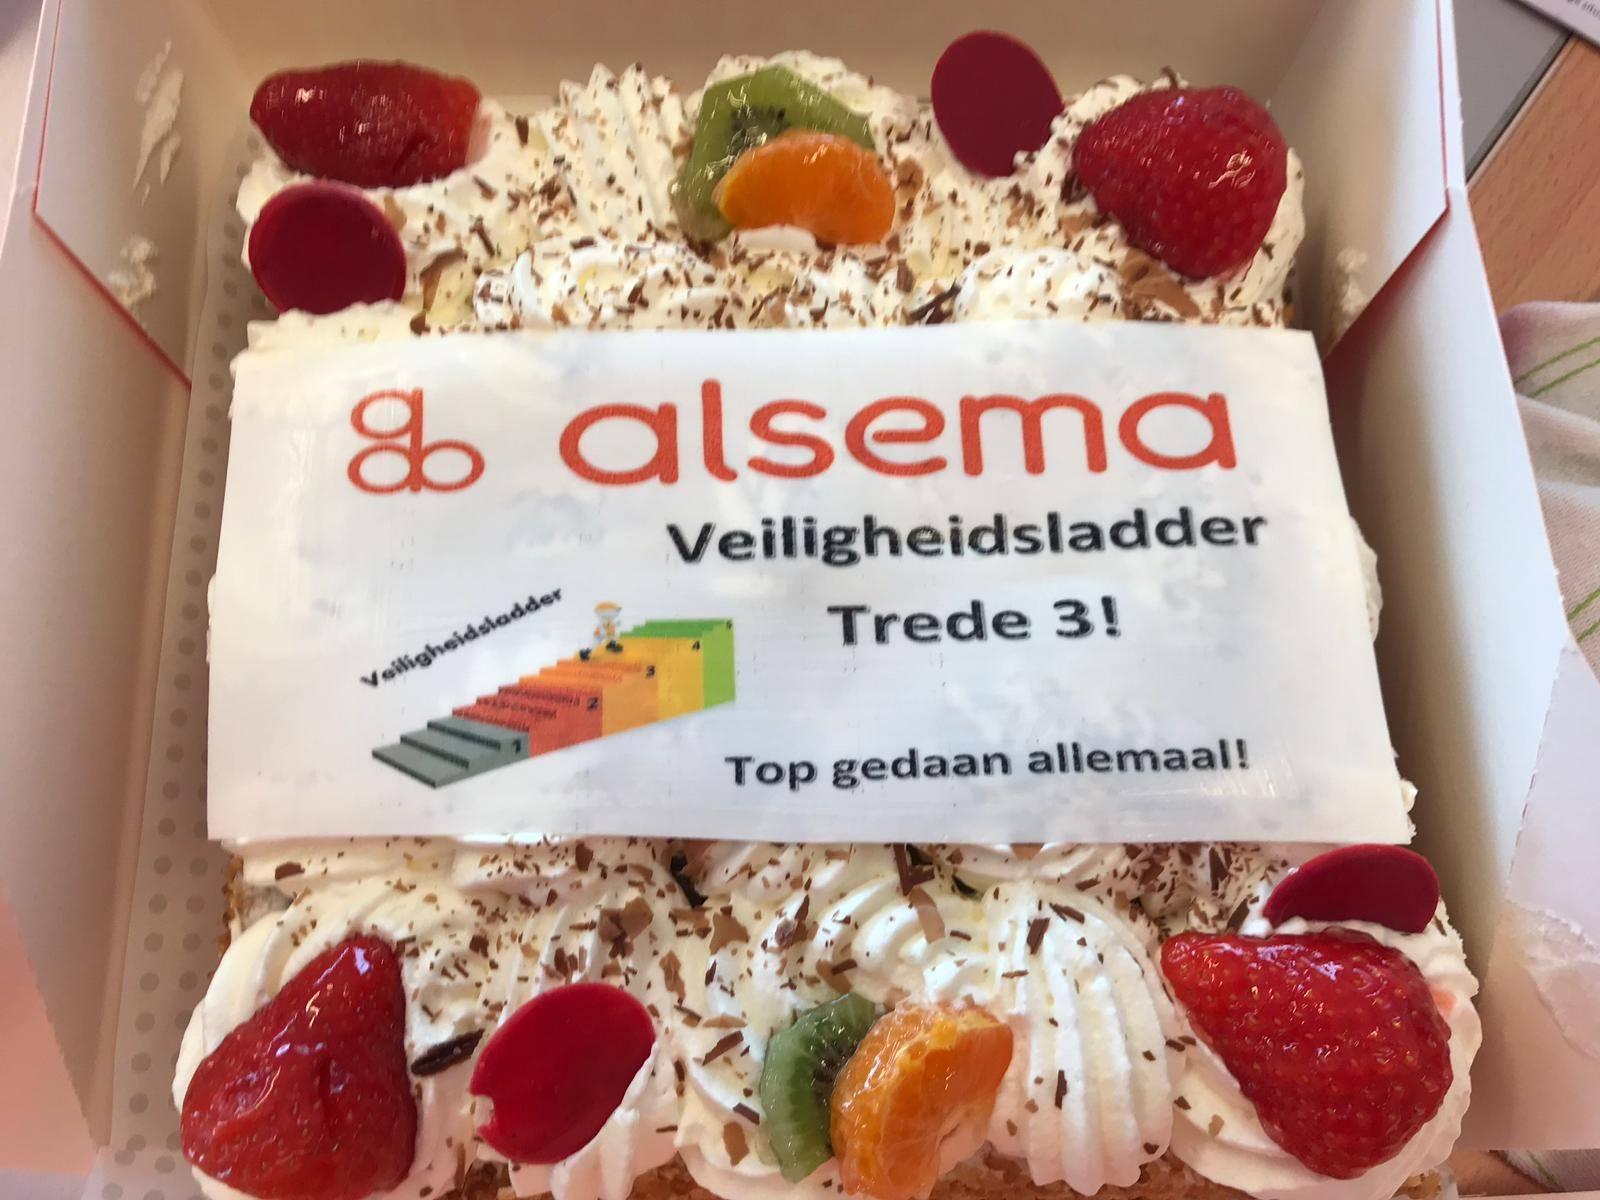 Veiligheidsladder certificaat trede 3 Alsema B.V.